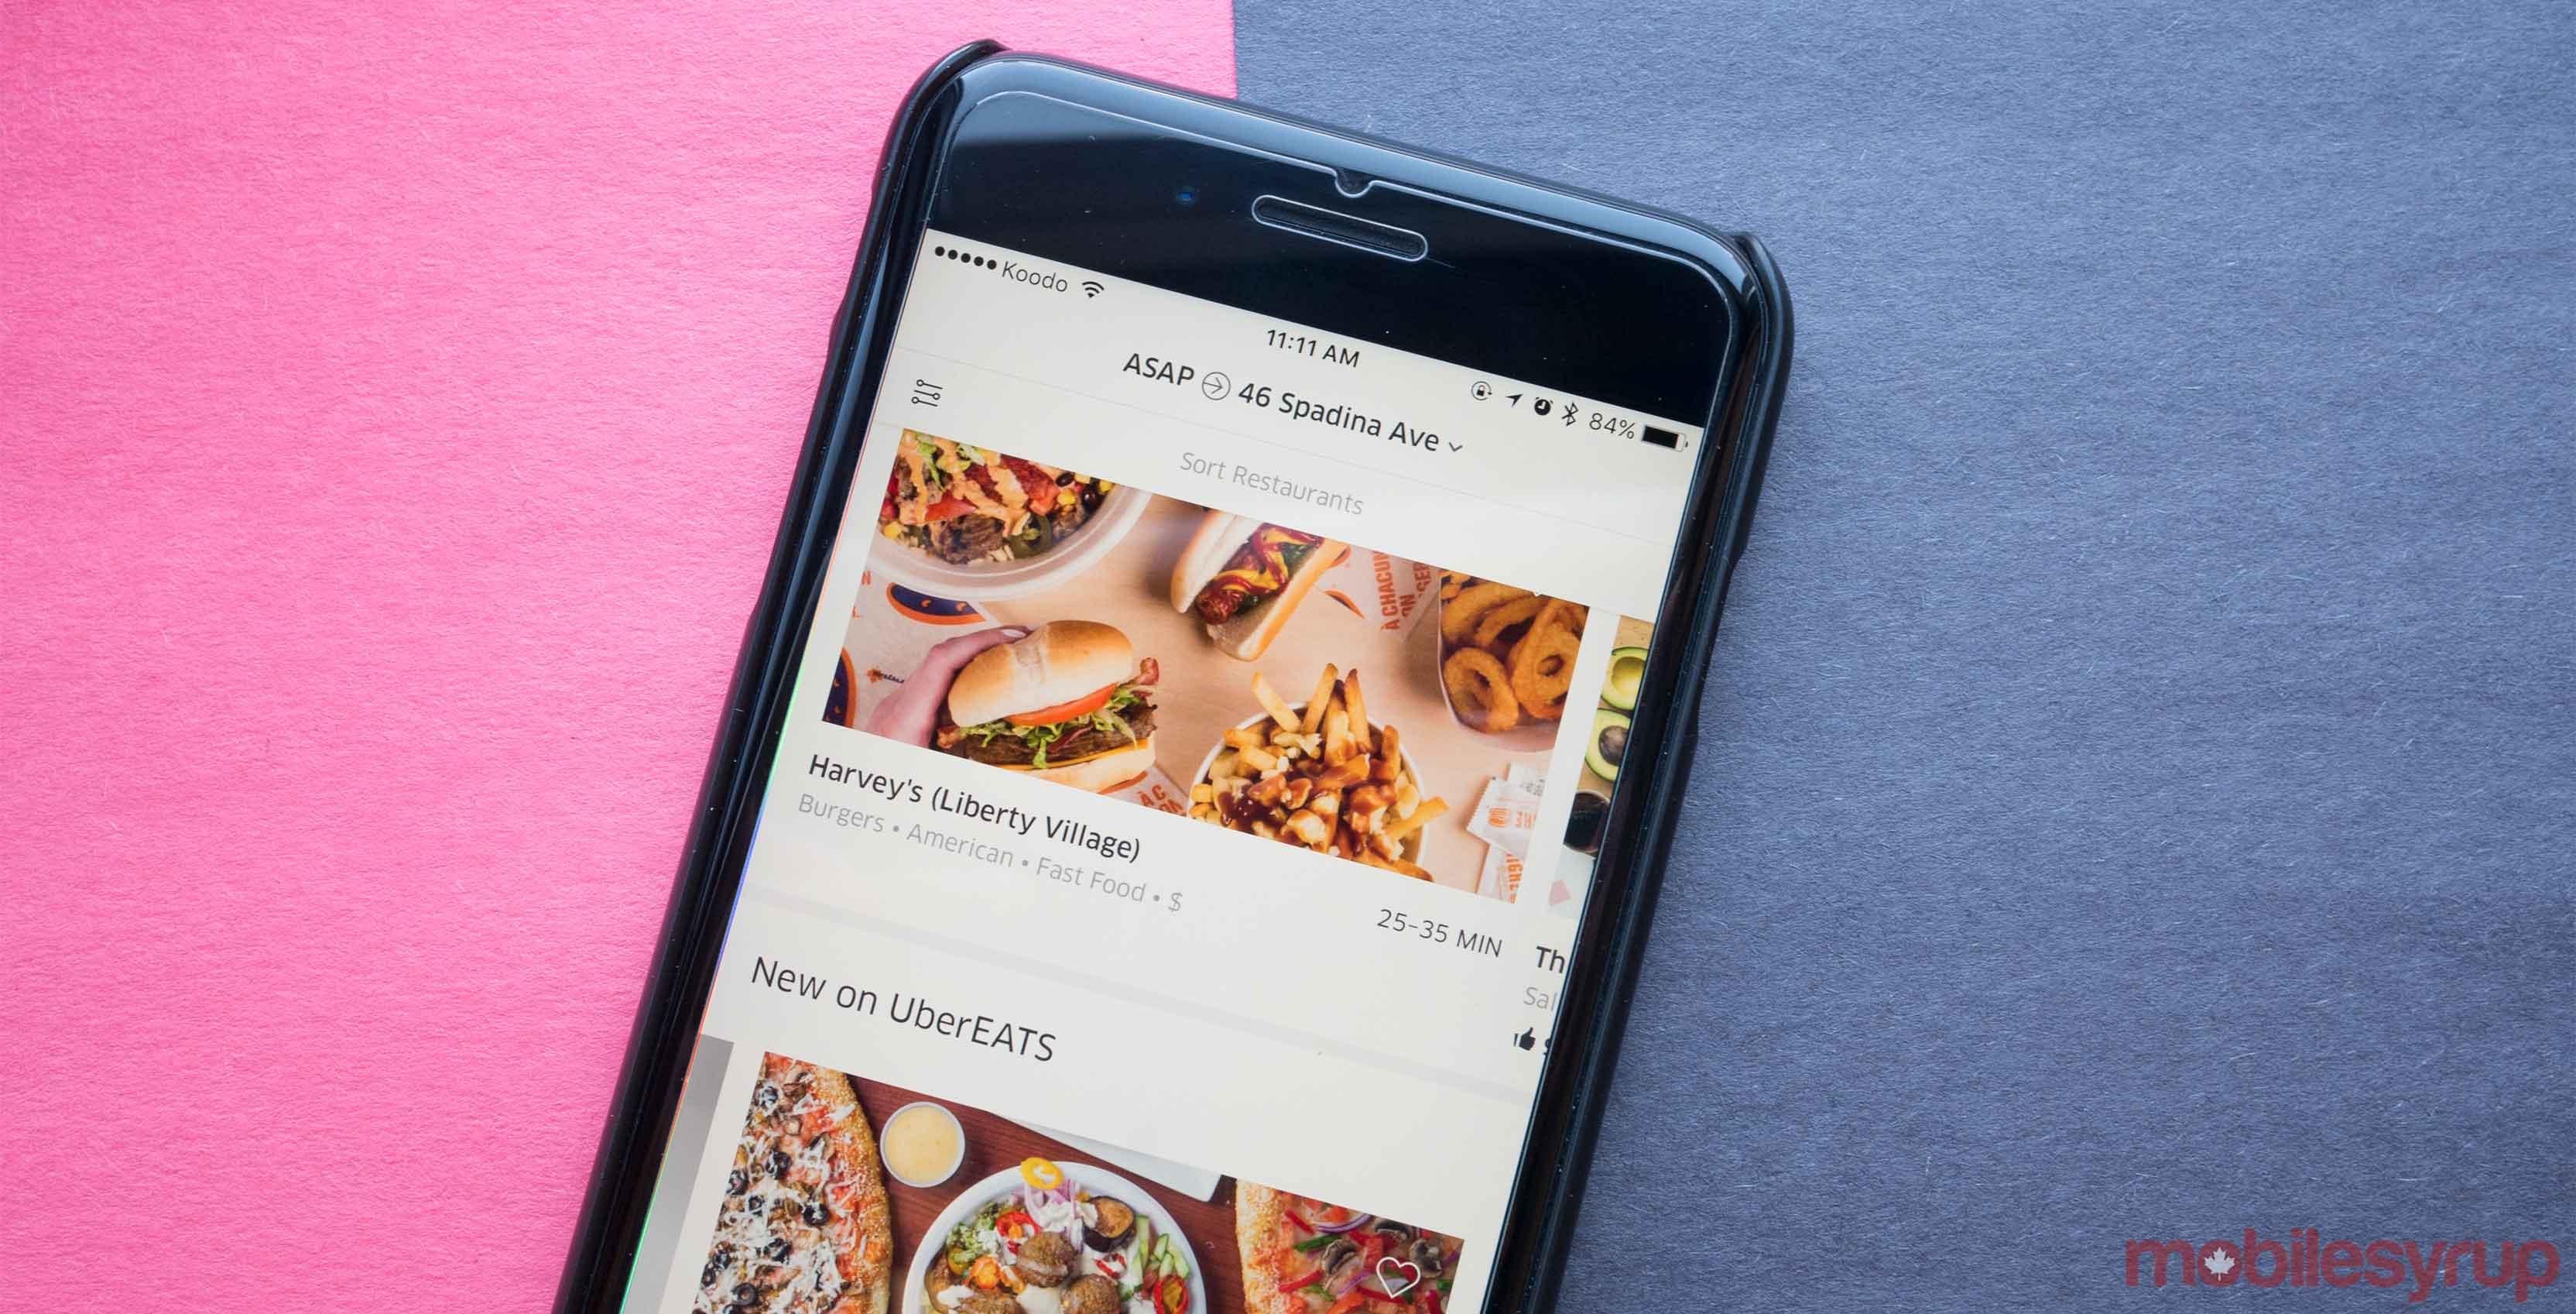 Uber Eats app on phone